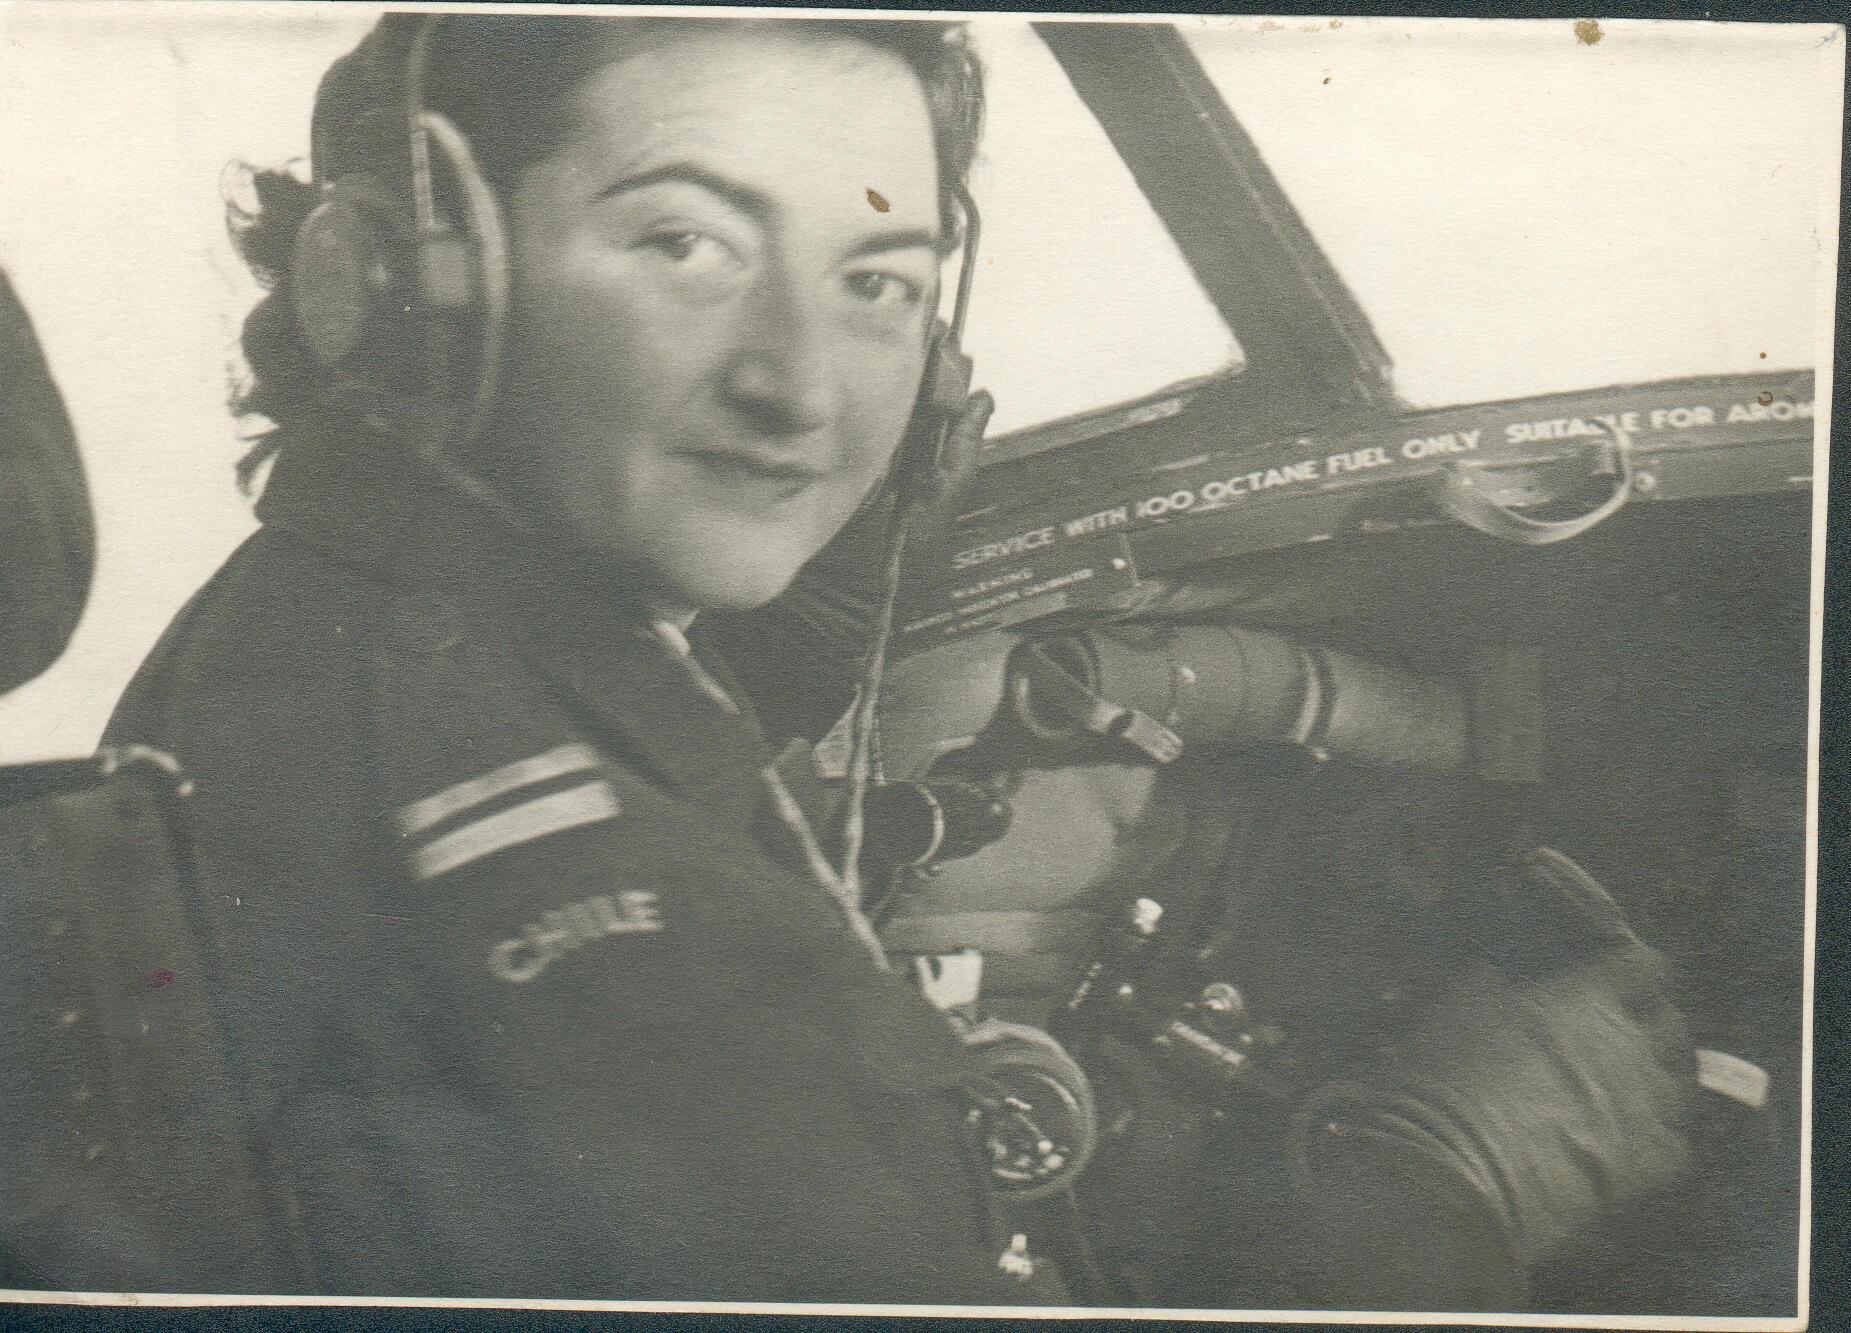 Margot Duhalde se formó como piloto en Chile.